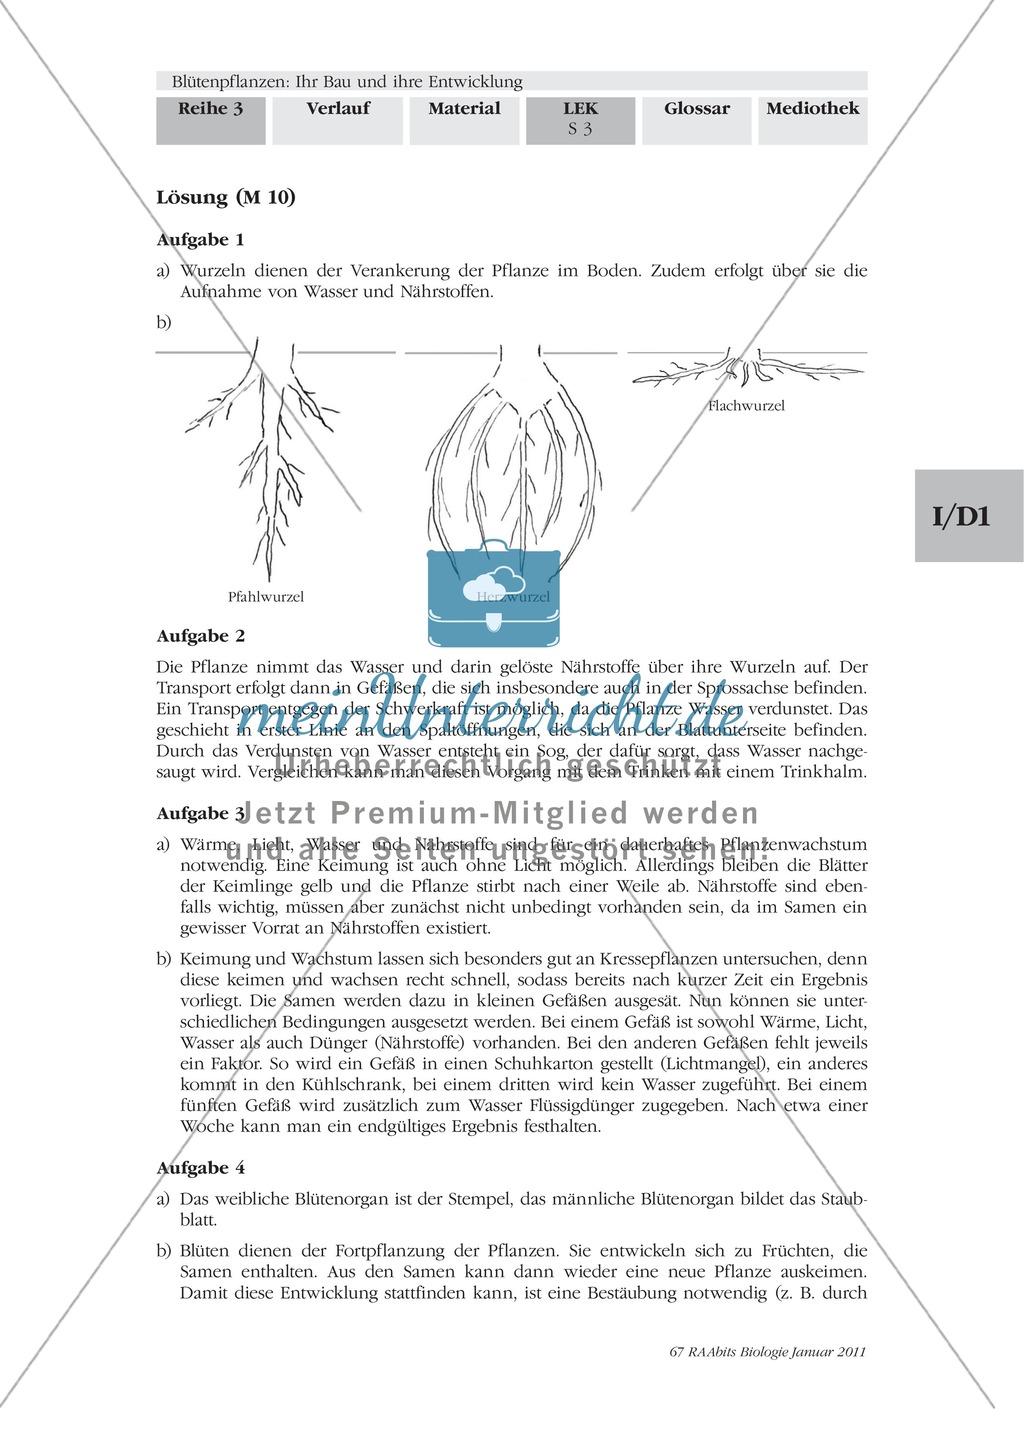 LEK Blütenpflanzen: Lückentext, Zeichnen Preview 2